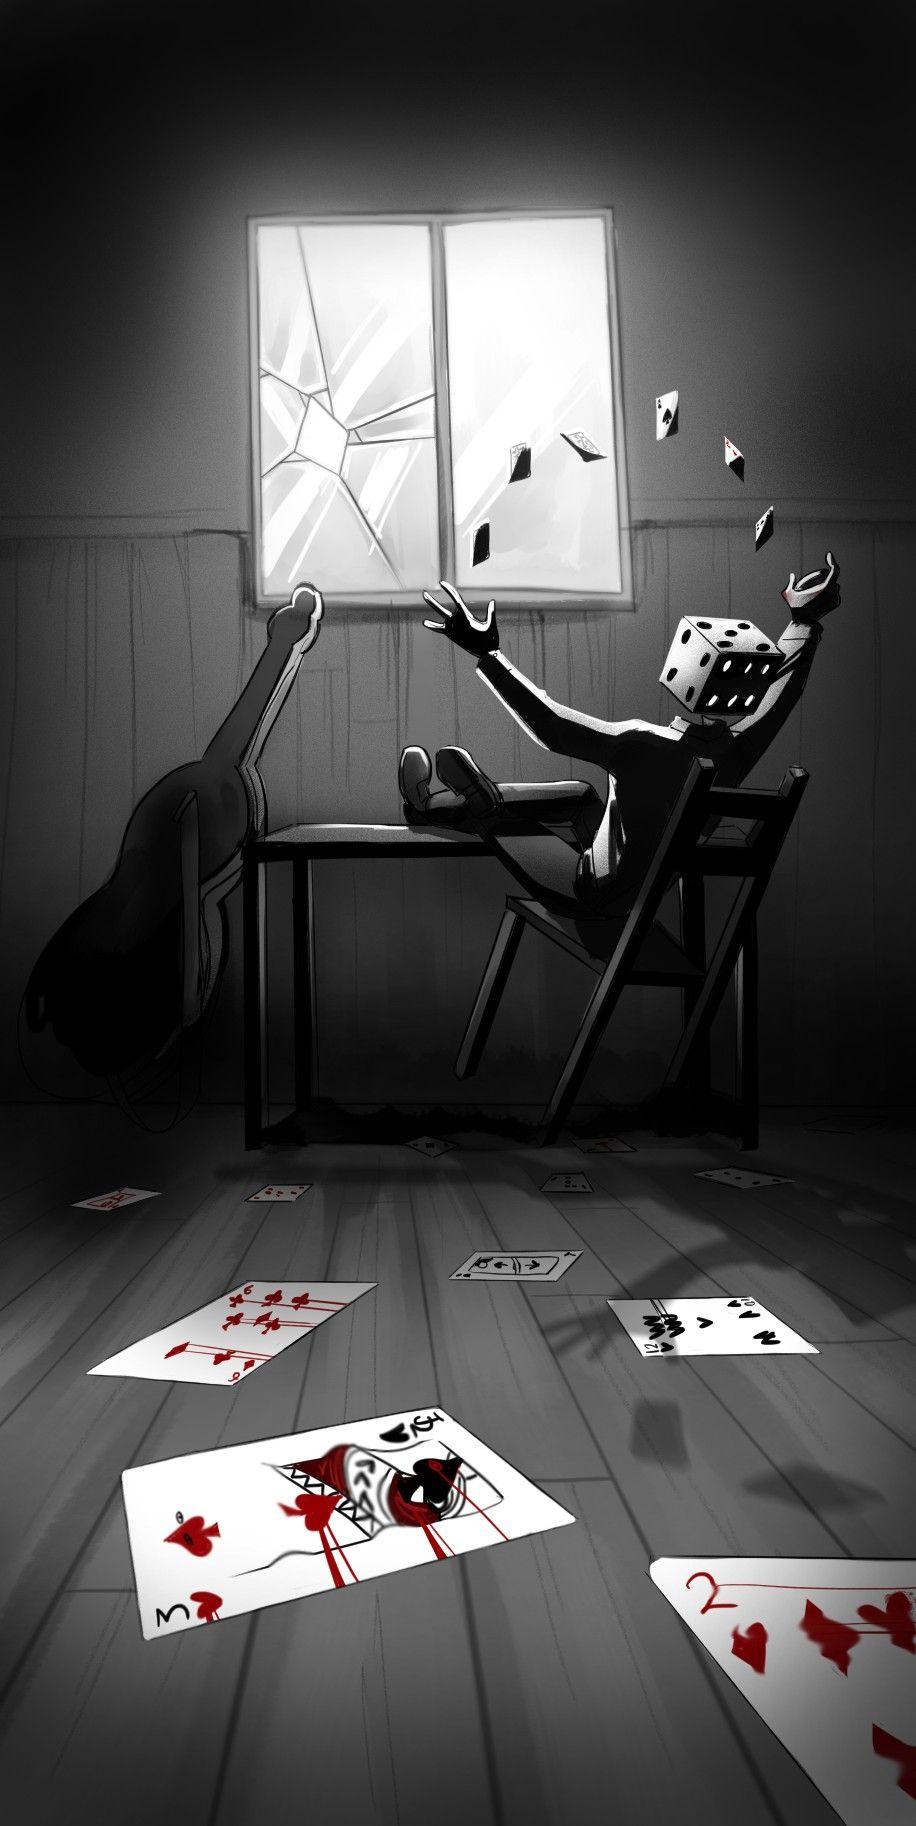 Pin On Cups Casino